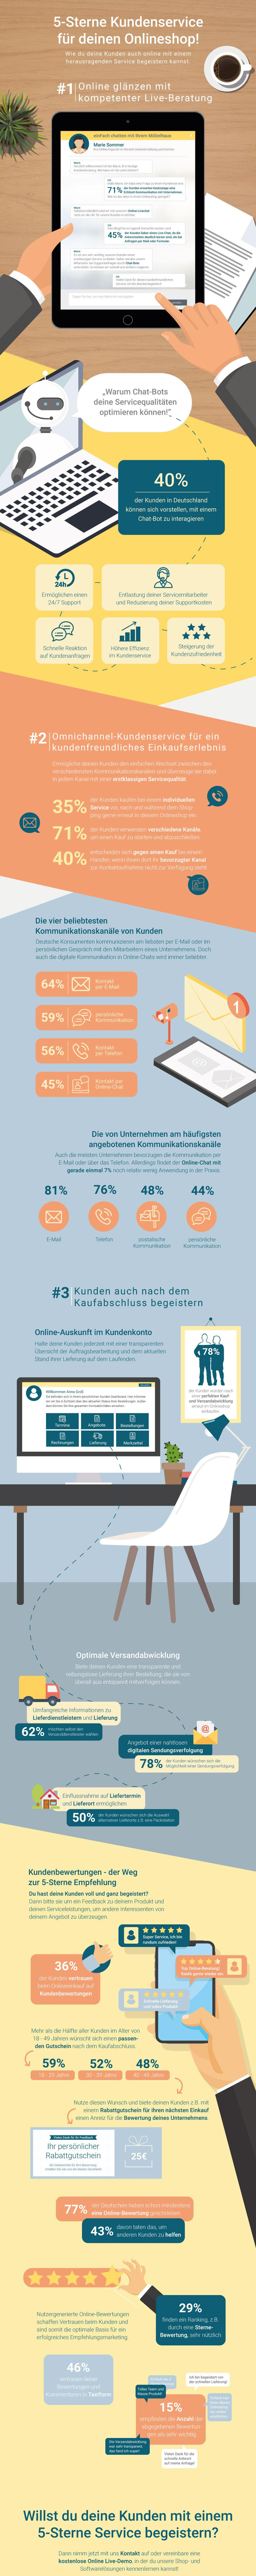 infografik-blogserie-teil2-onlineloesungen-kundenservice-12-2019-e1-v12